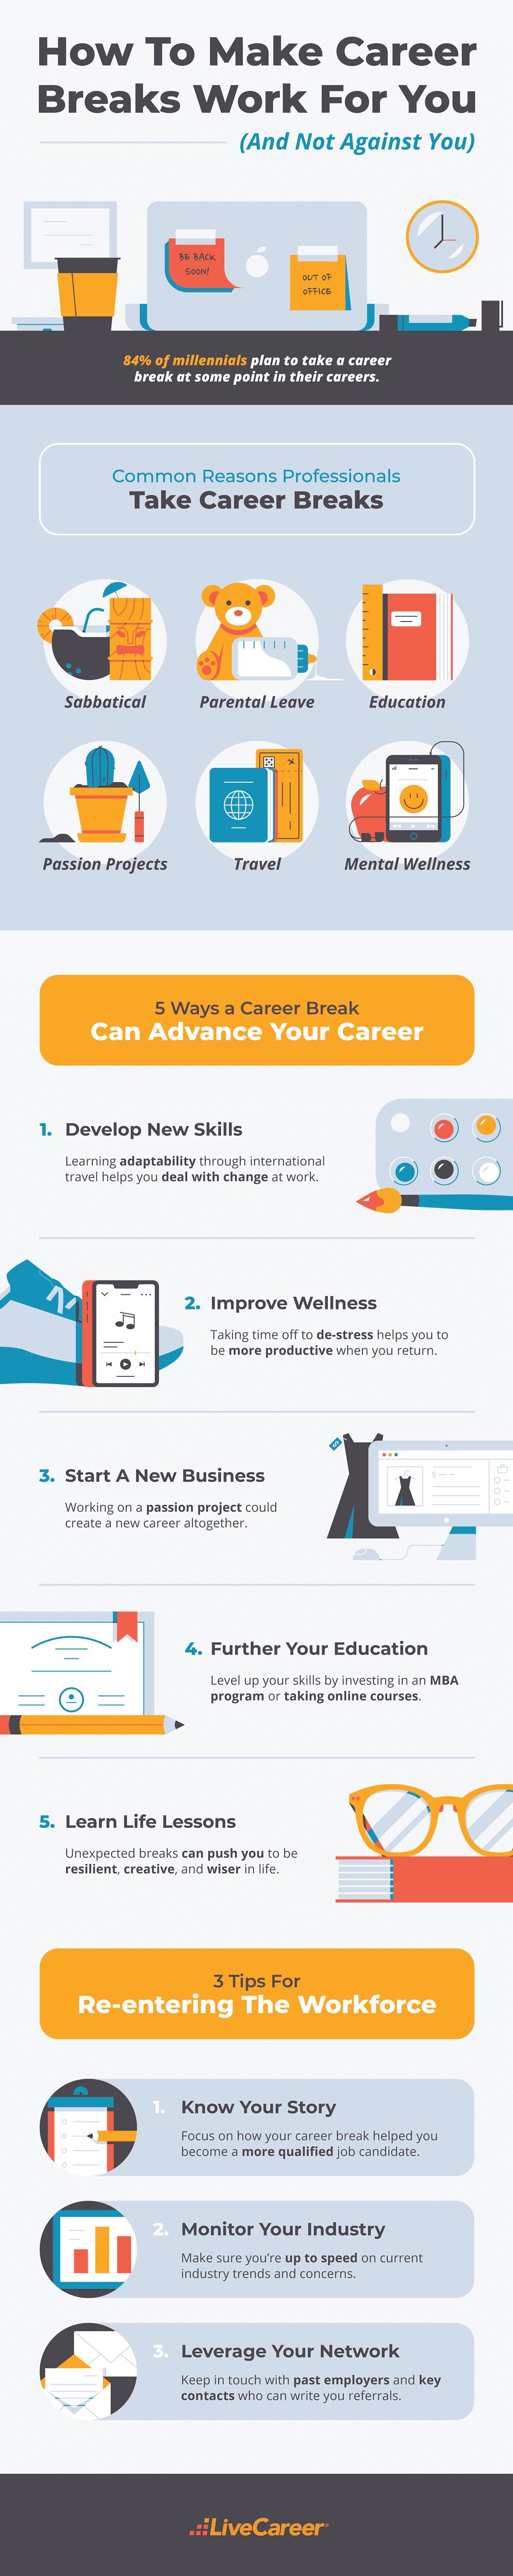 career-breaks-for-professionals